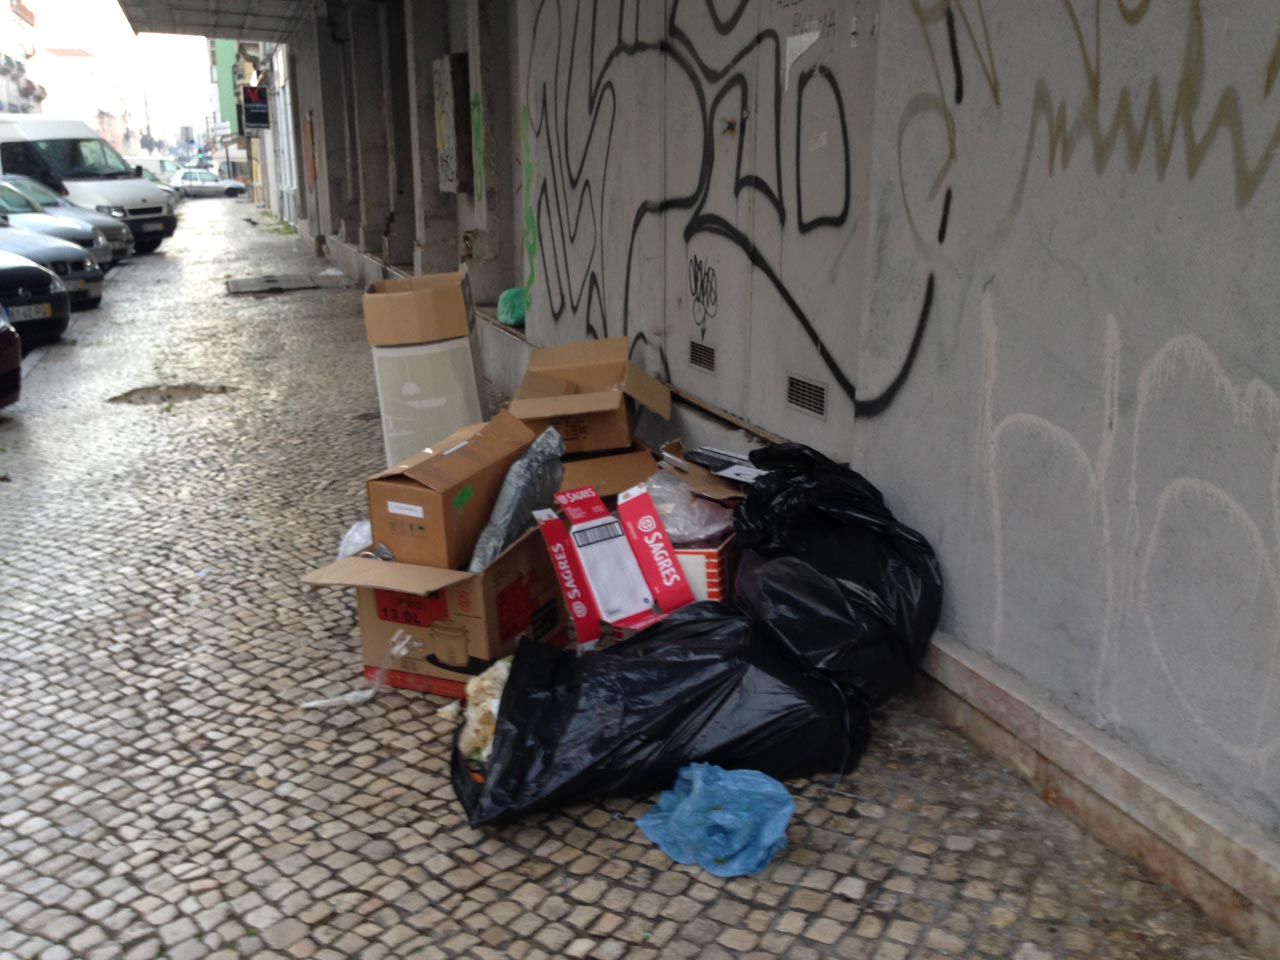 Lixo na rua em Lisboa. Mesmo na porta de casa - Pedro Rebelo